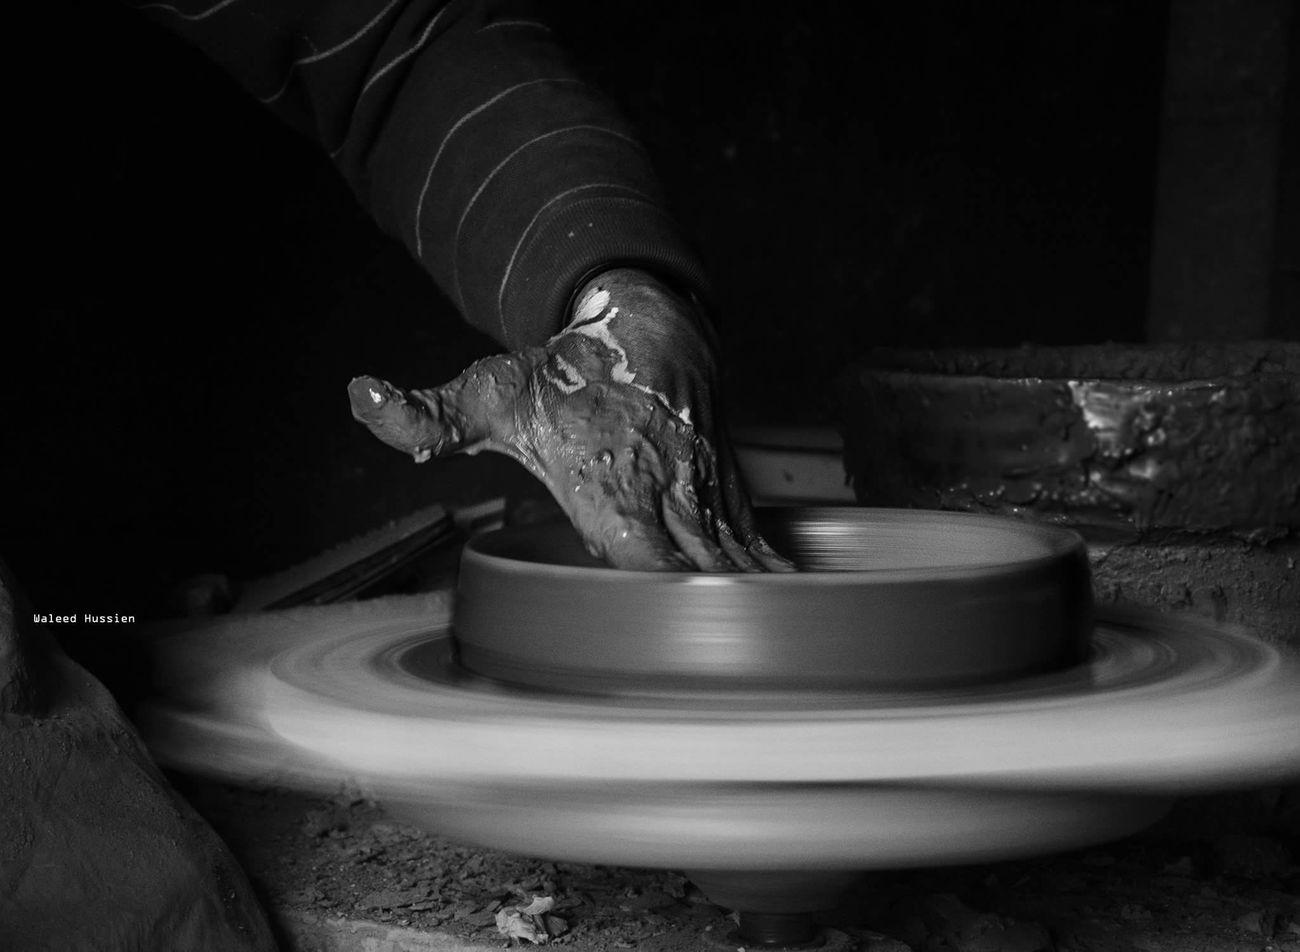 Cairo Nikon Hello World Blackandwhite Photography EyeEm Best Shots Streetphoto Streetphotography Egyptian Blackandwhite Black And White Street Photography Taking Photos Street Photographer Monochrome Streetphotography_bw Stree Photography B&W Portrait People Street Life Hands At Work Working Hard Hands